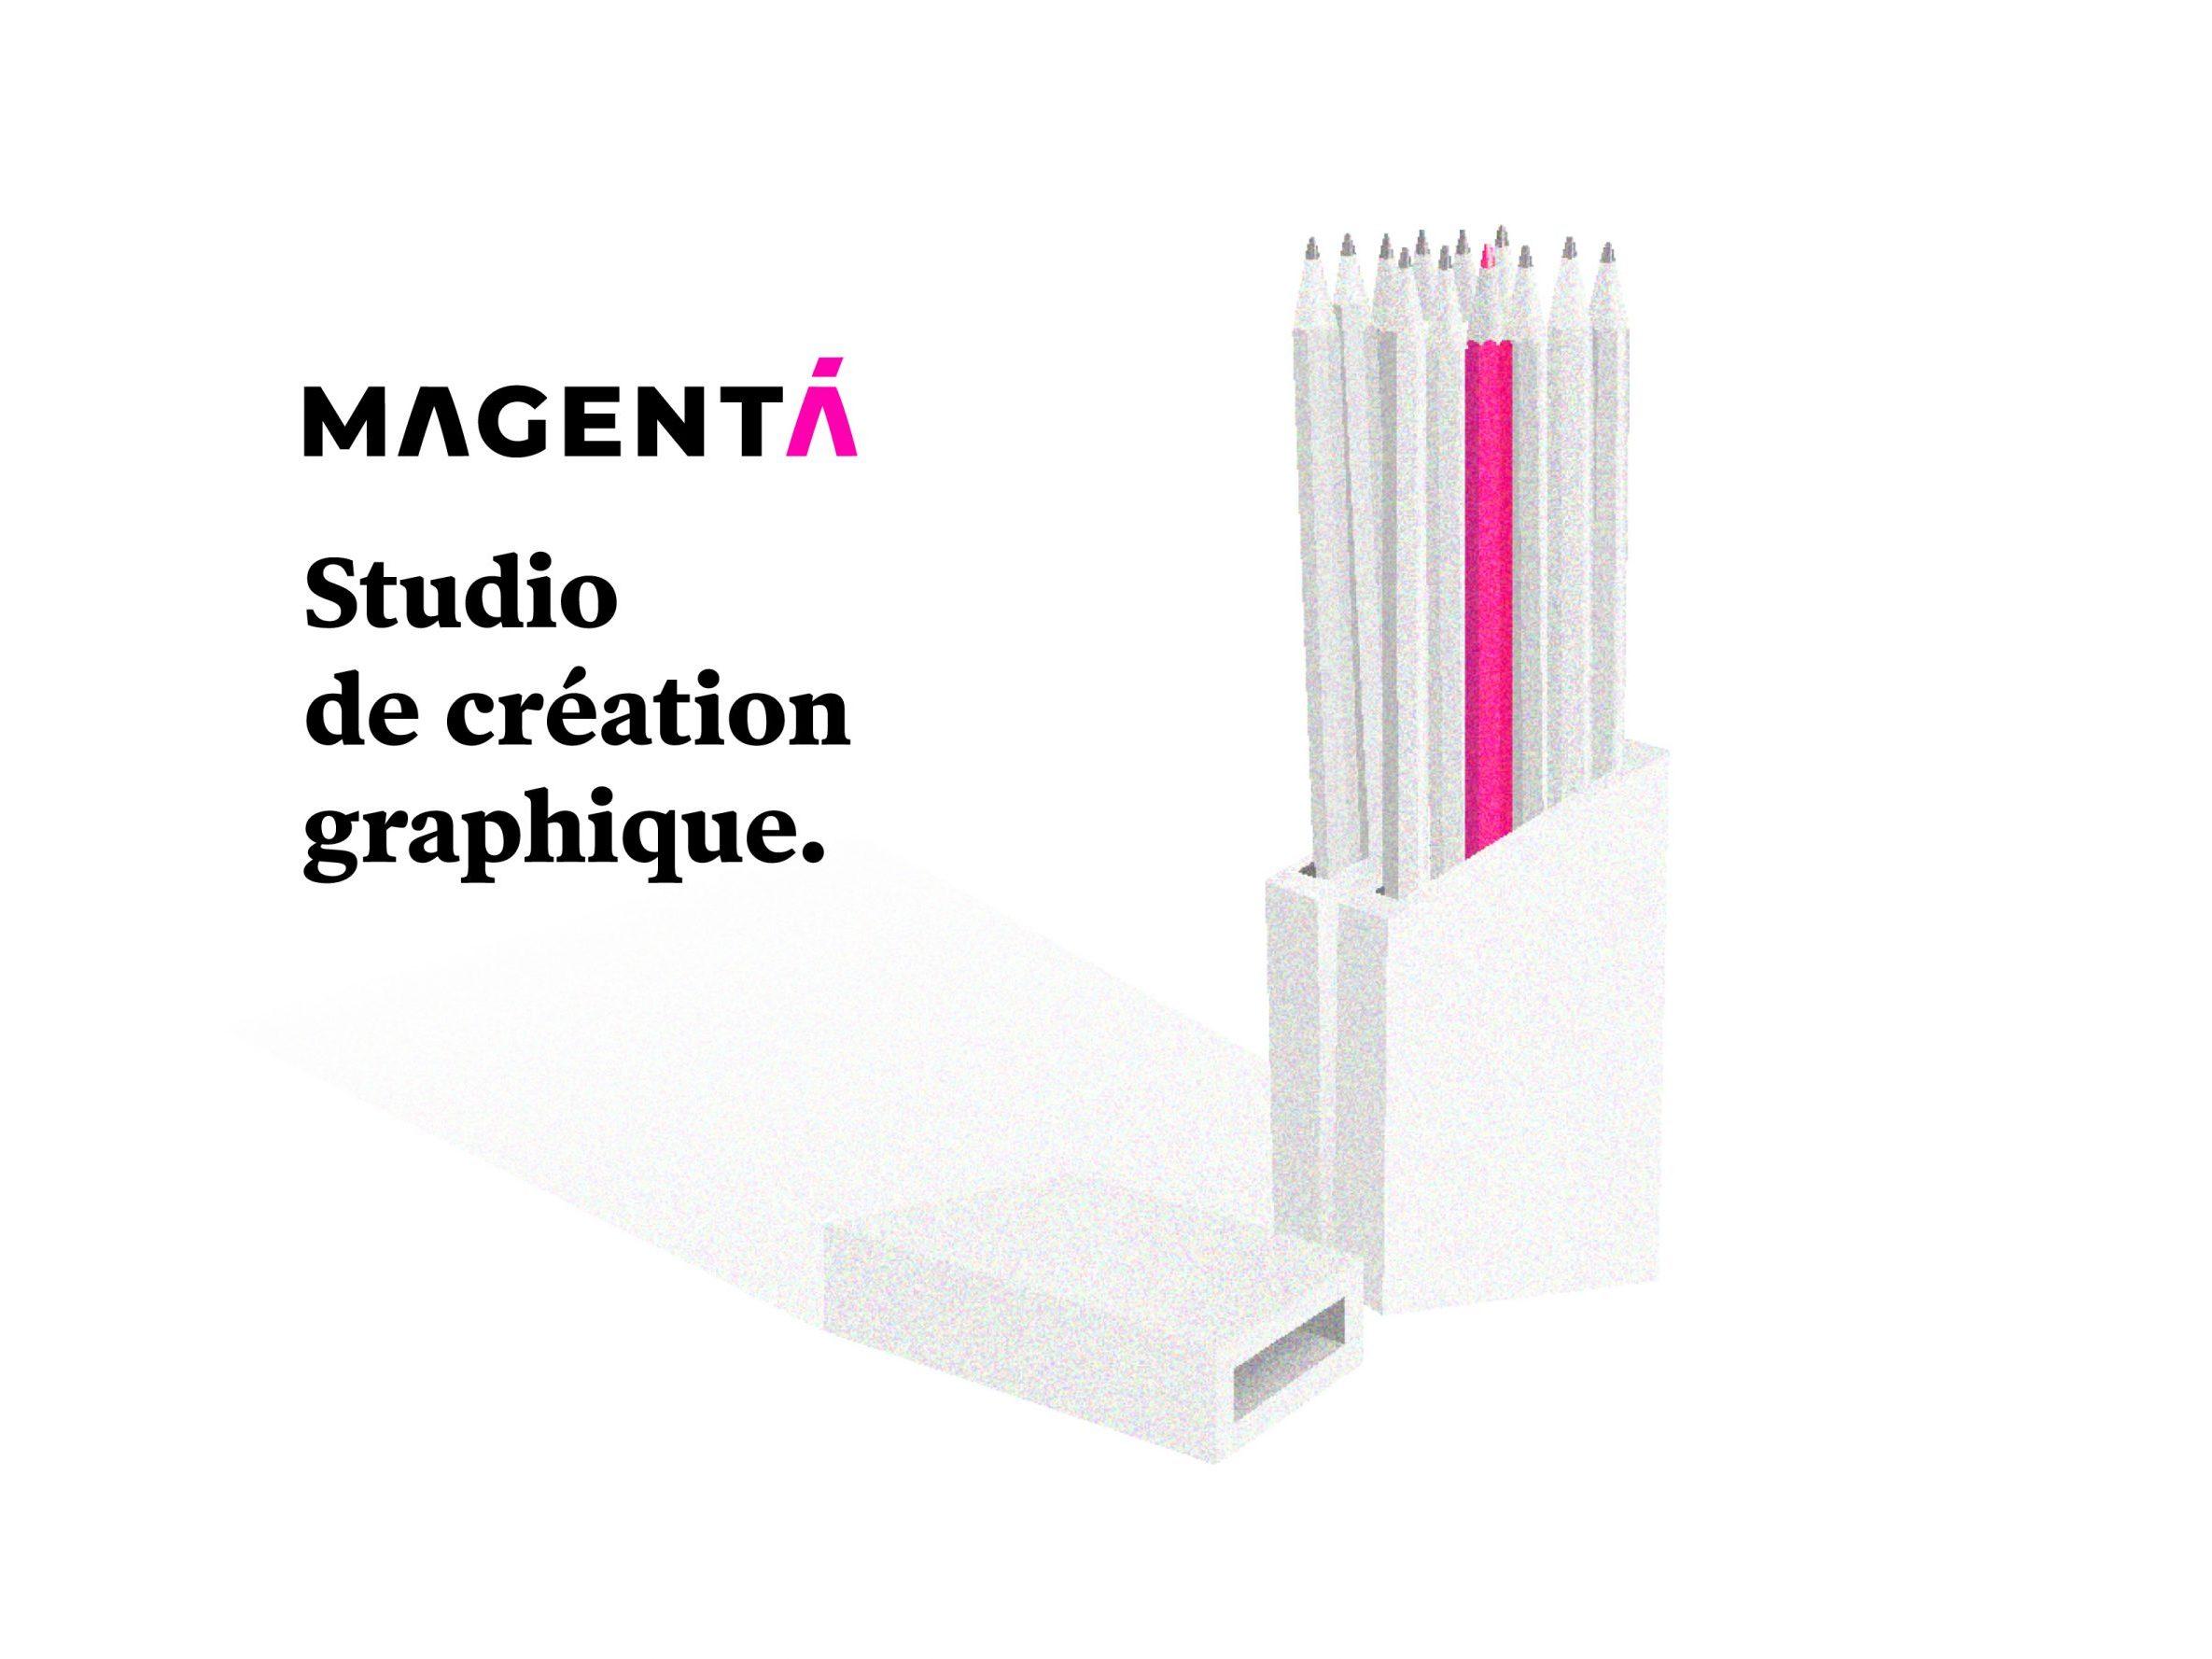 Photo Magenta Studio